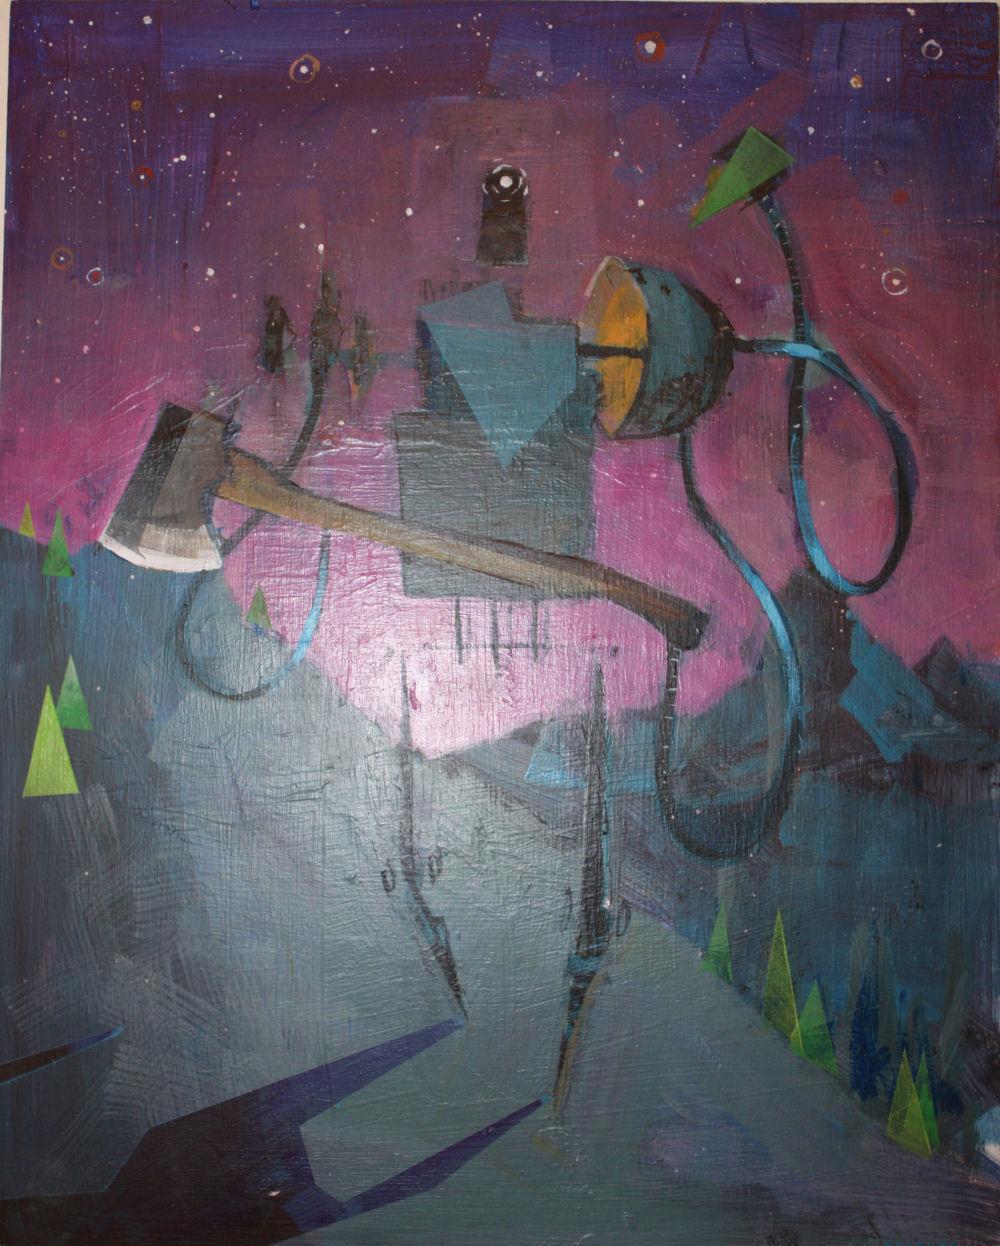 kwanchai-moriya-art-010-giant-robot